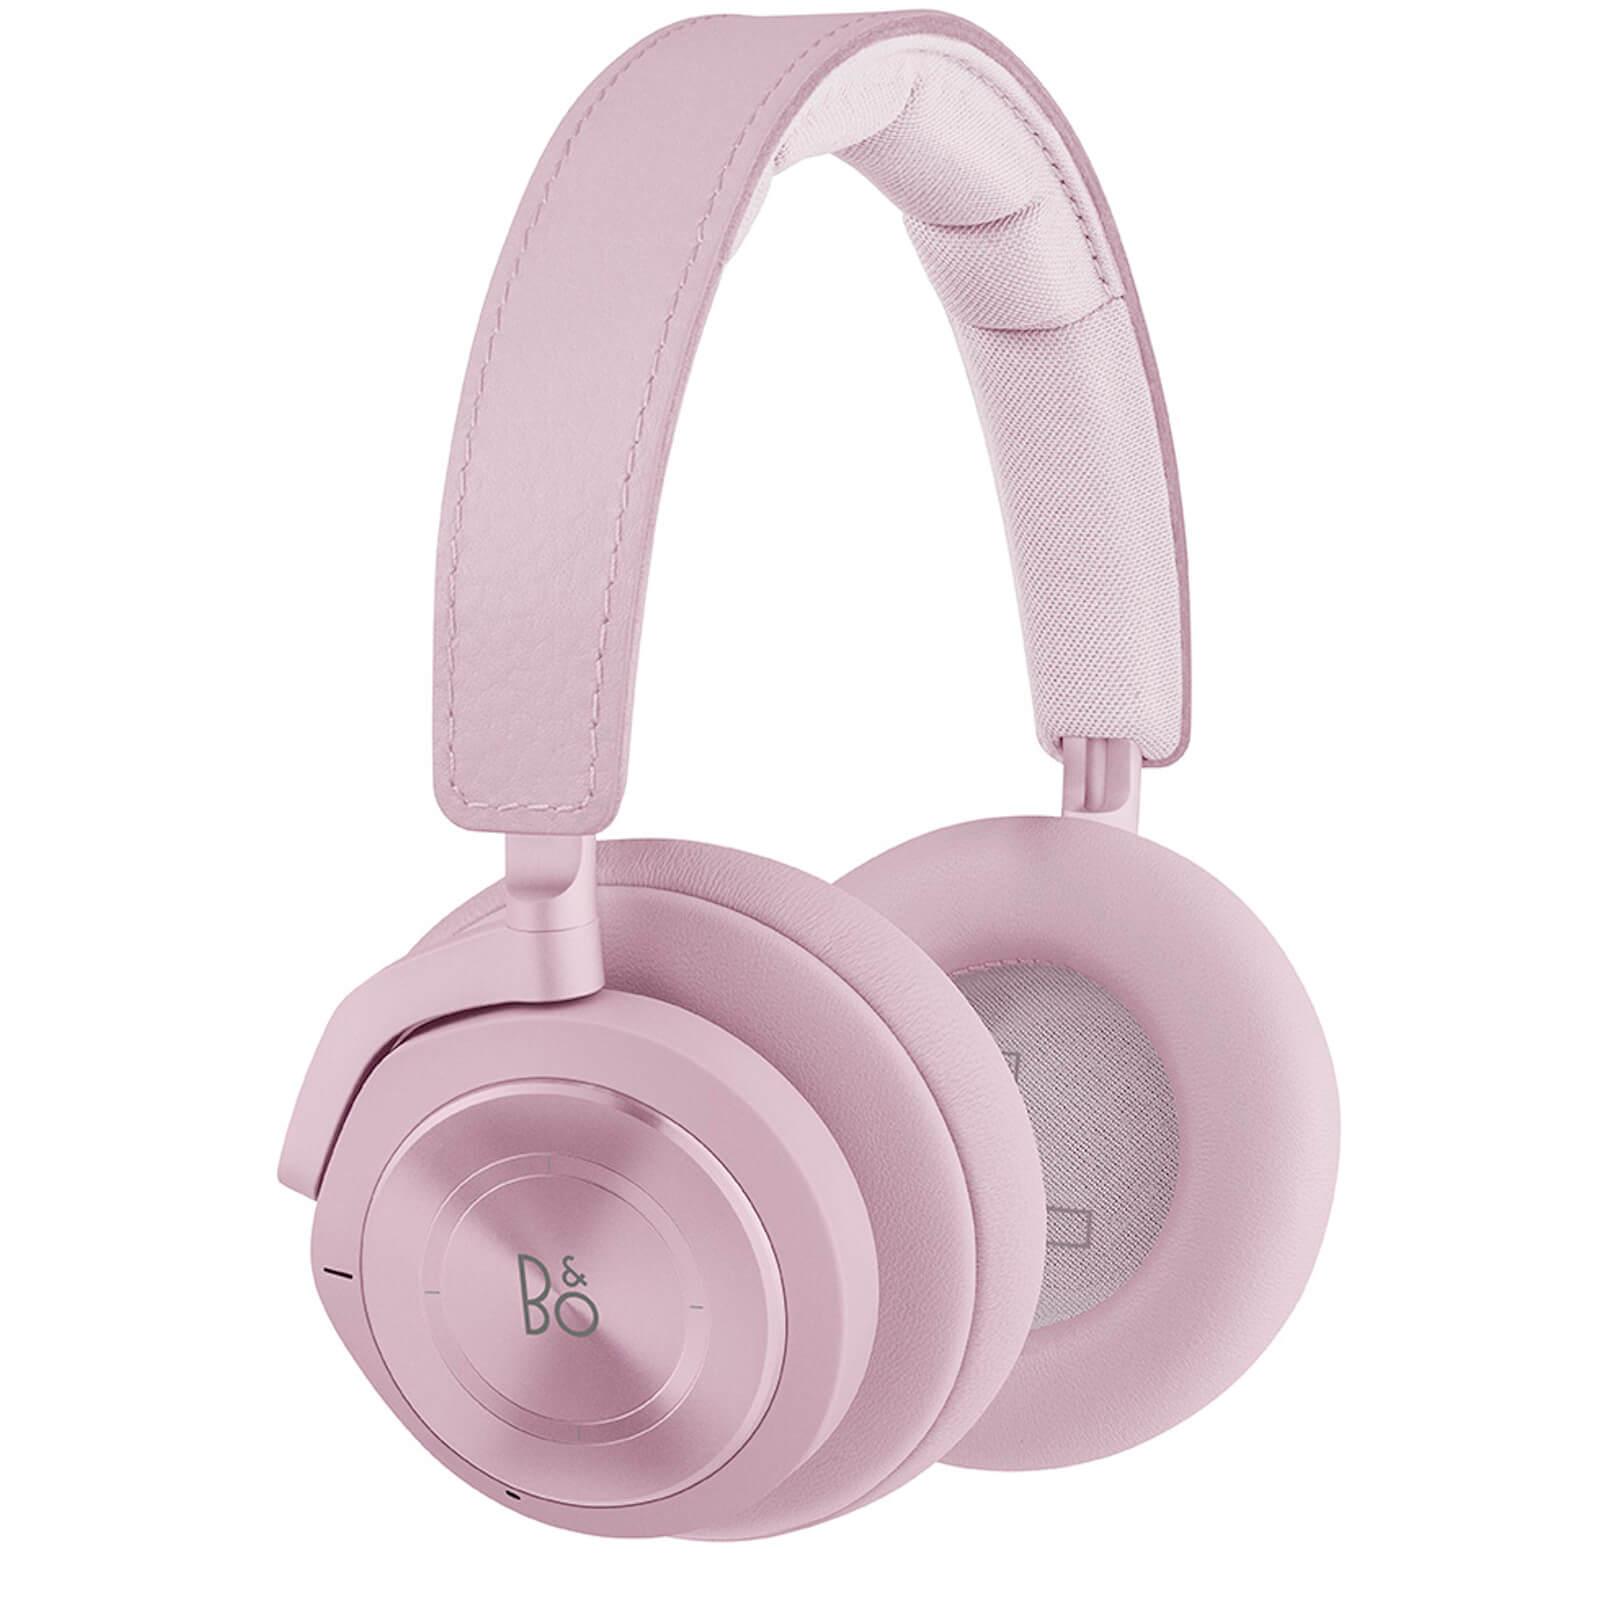 Bang & Olufsen Beoplay H9 3rd Gen Peony ANC Headphones